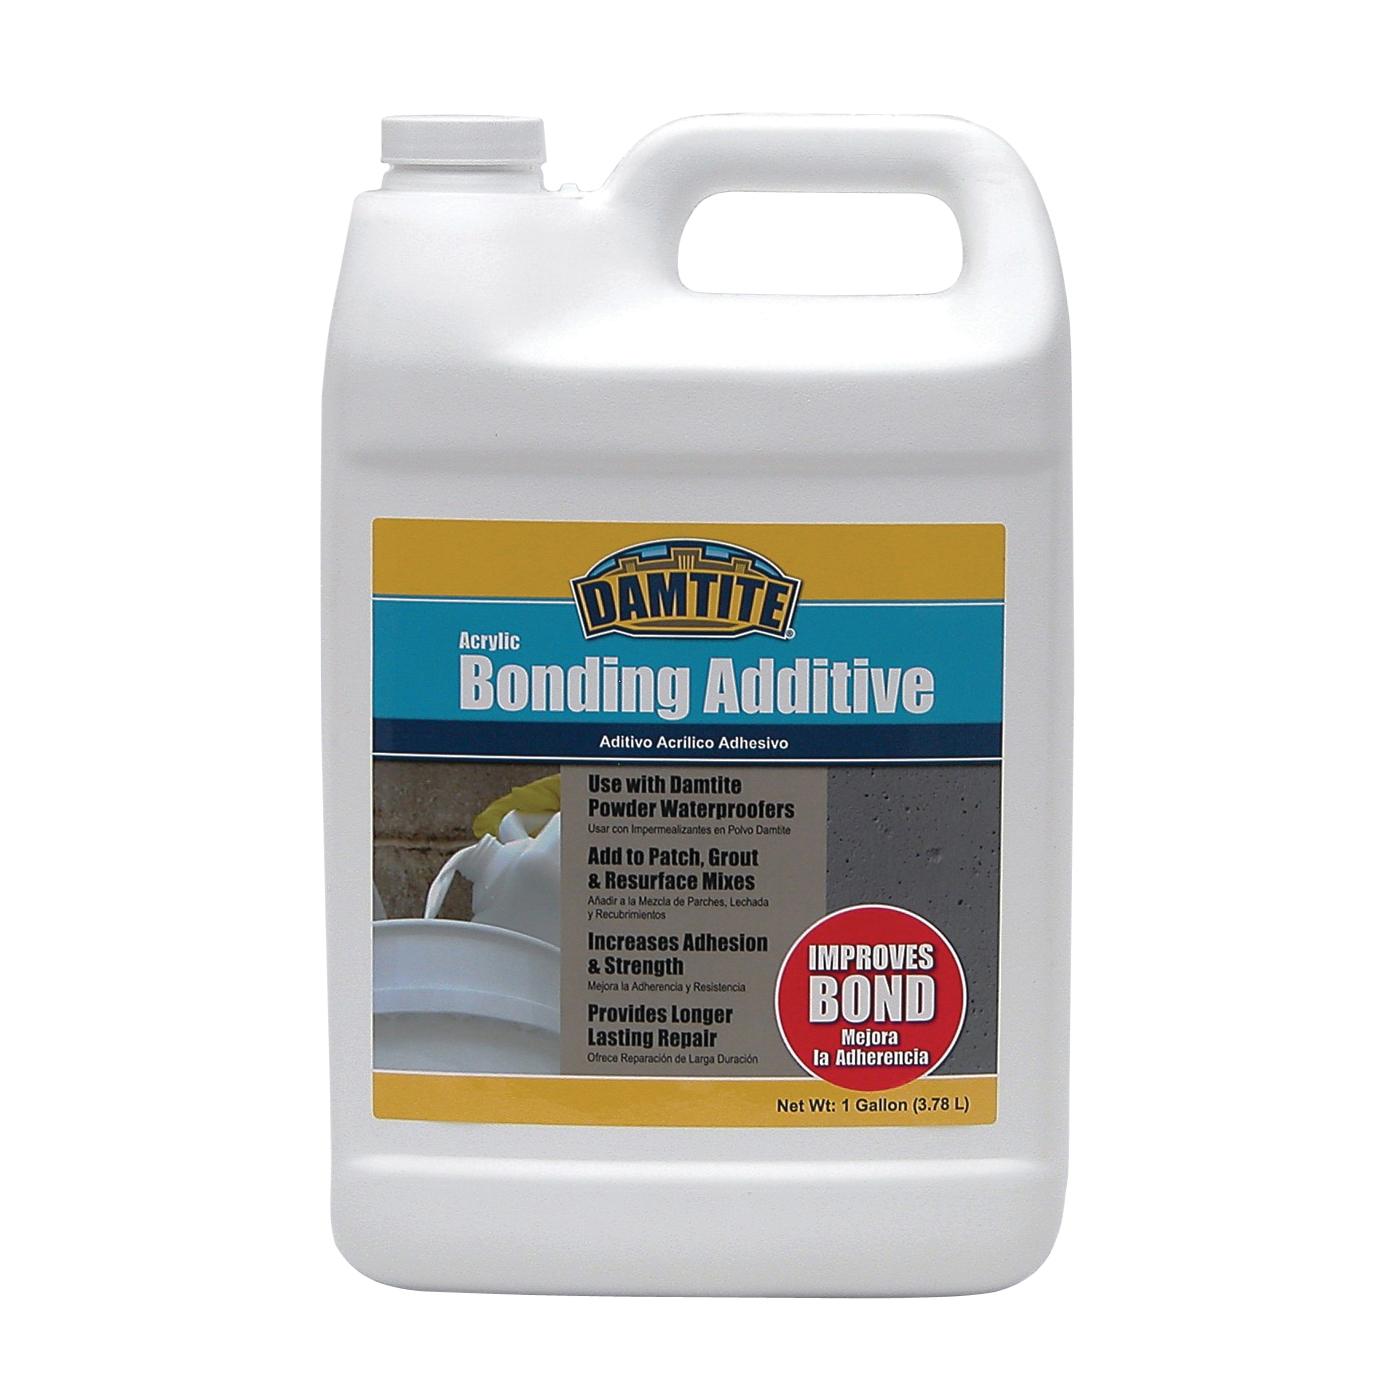 Picture of DAMTITE 05370 Bonding Additive, Liquid, Ammonia, White, 1 gal Package, Bottle